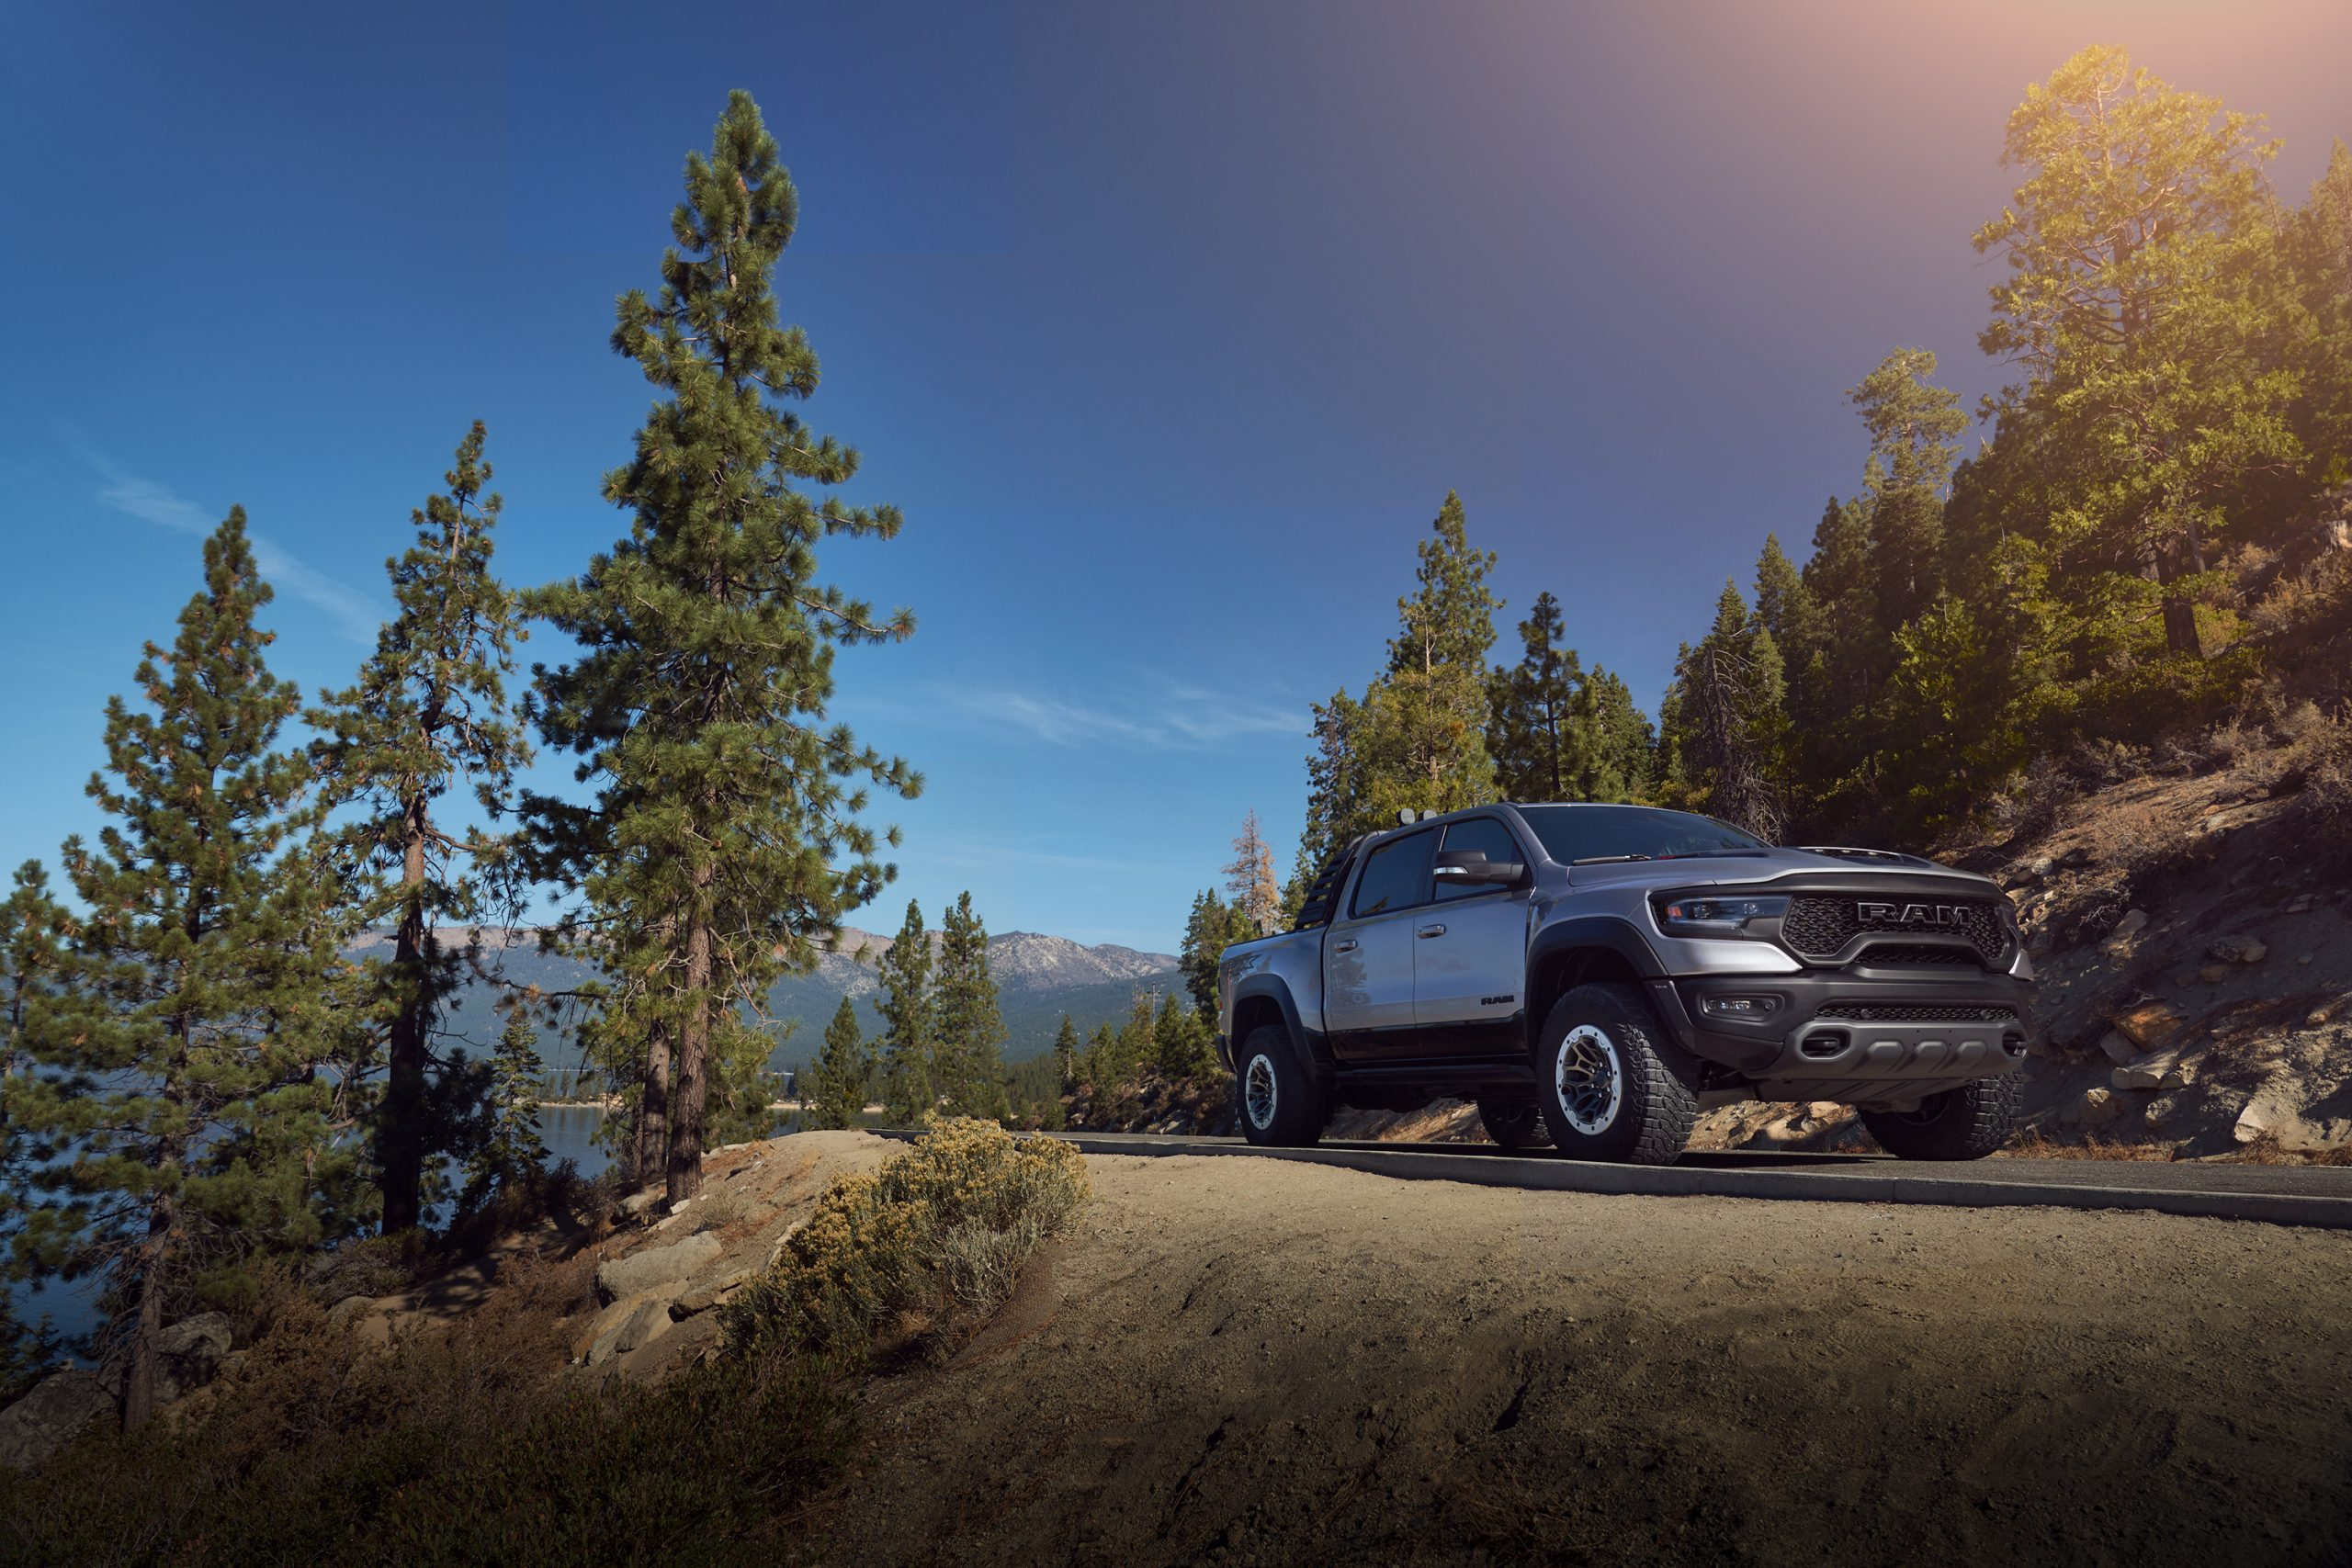 2021 Ram 1500 TRX front three-quarter mountain pass road